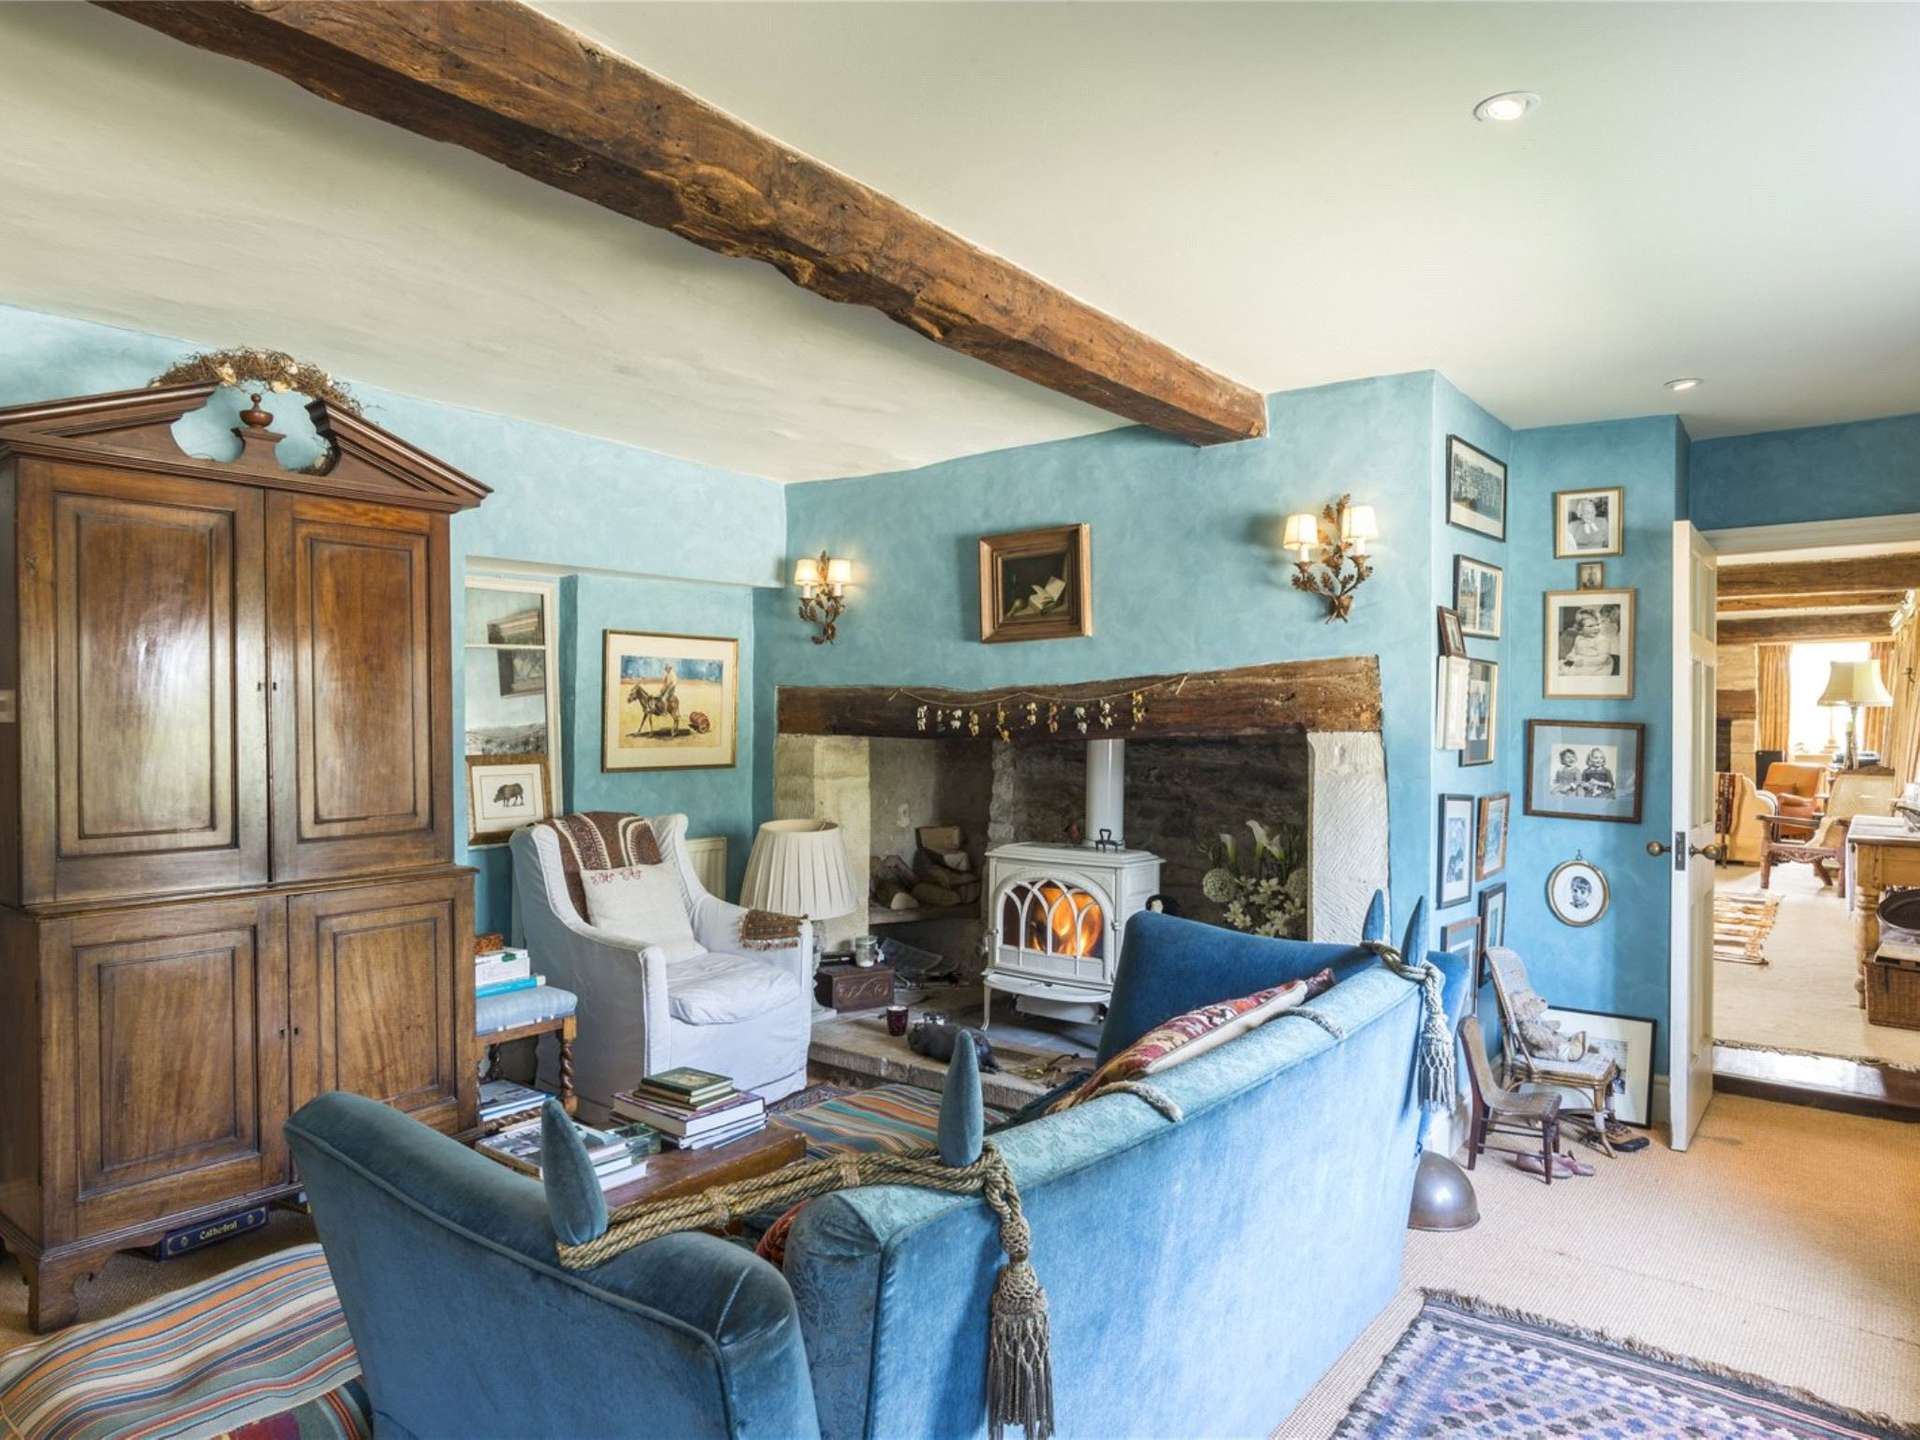 Savills | Oaksey, Malmesbury, Wiltshire, SN16 9SD | Property for sale